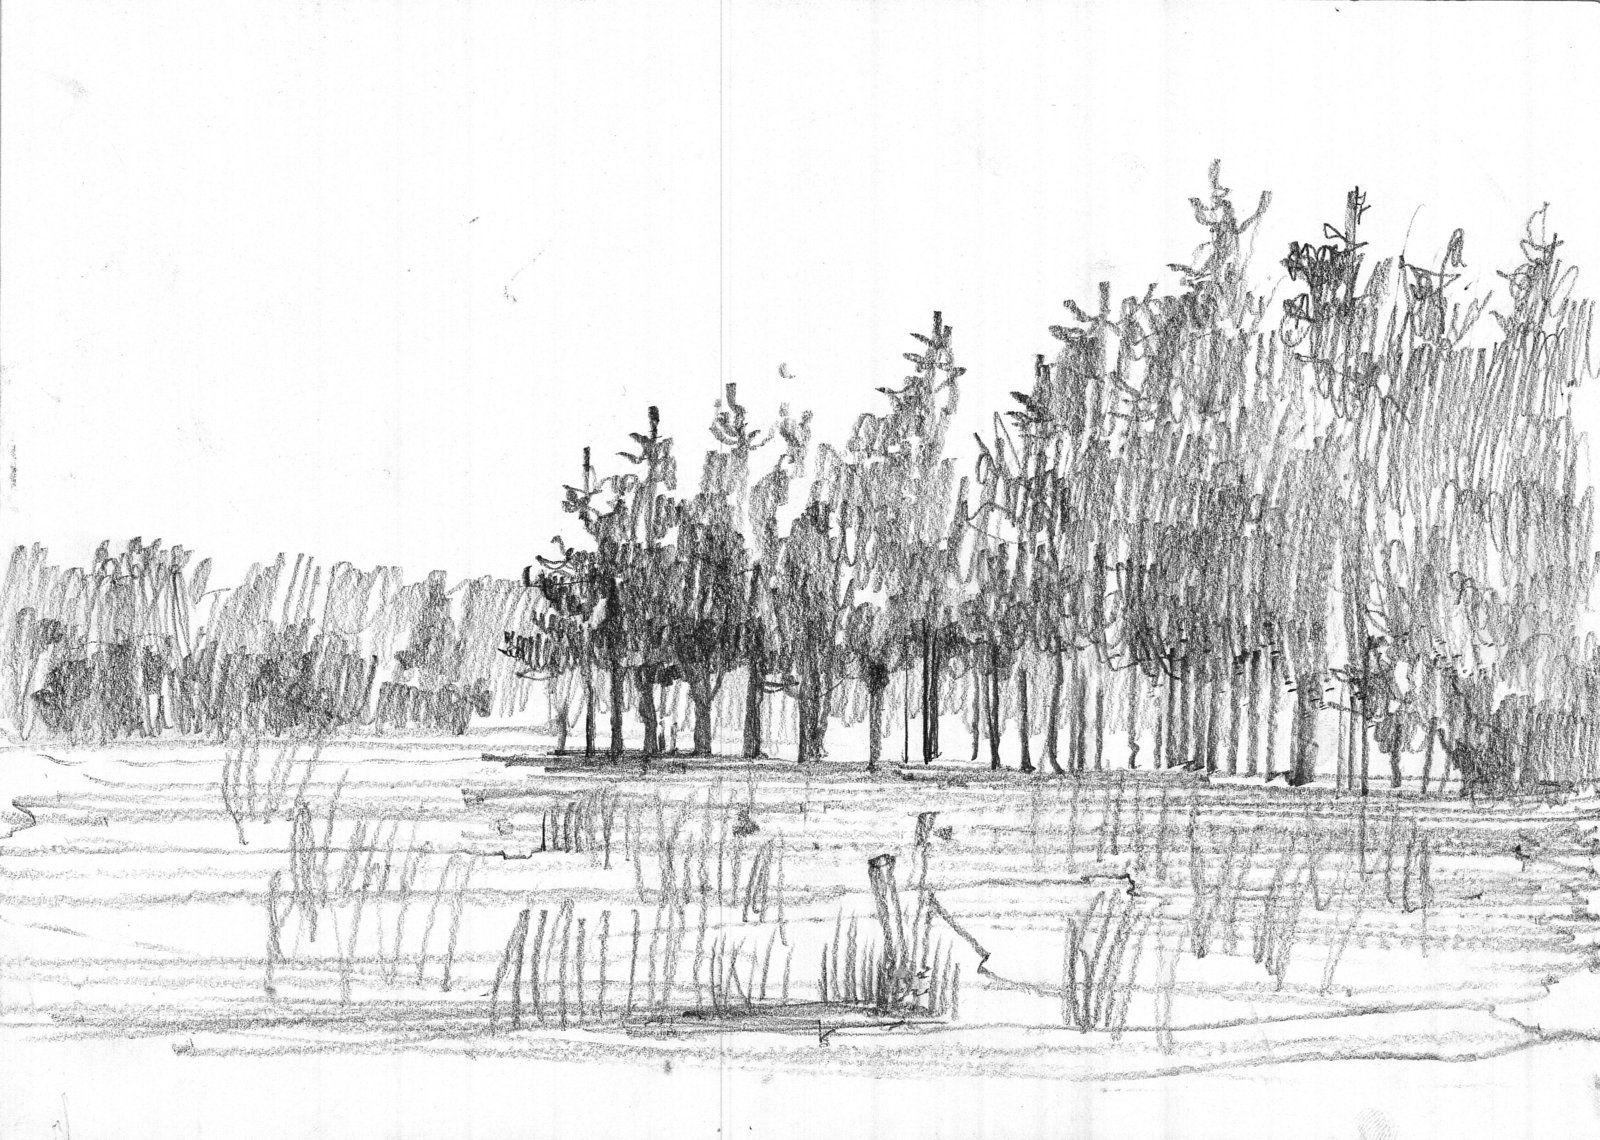 New Forest Sketch. by Krystian0Wozniak.deviantart.com on ...